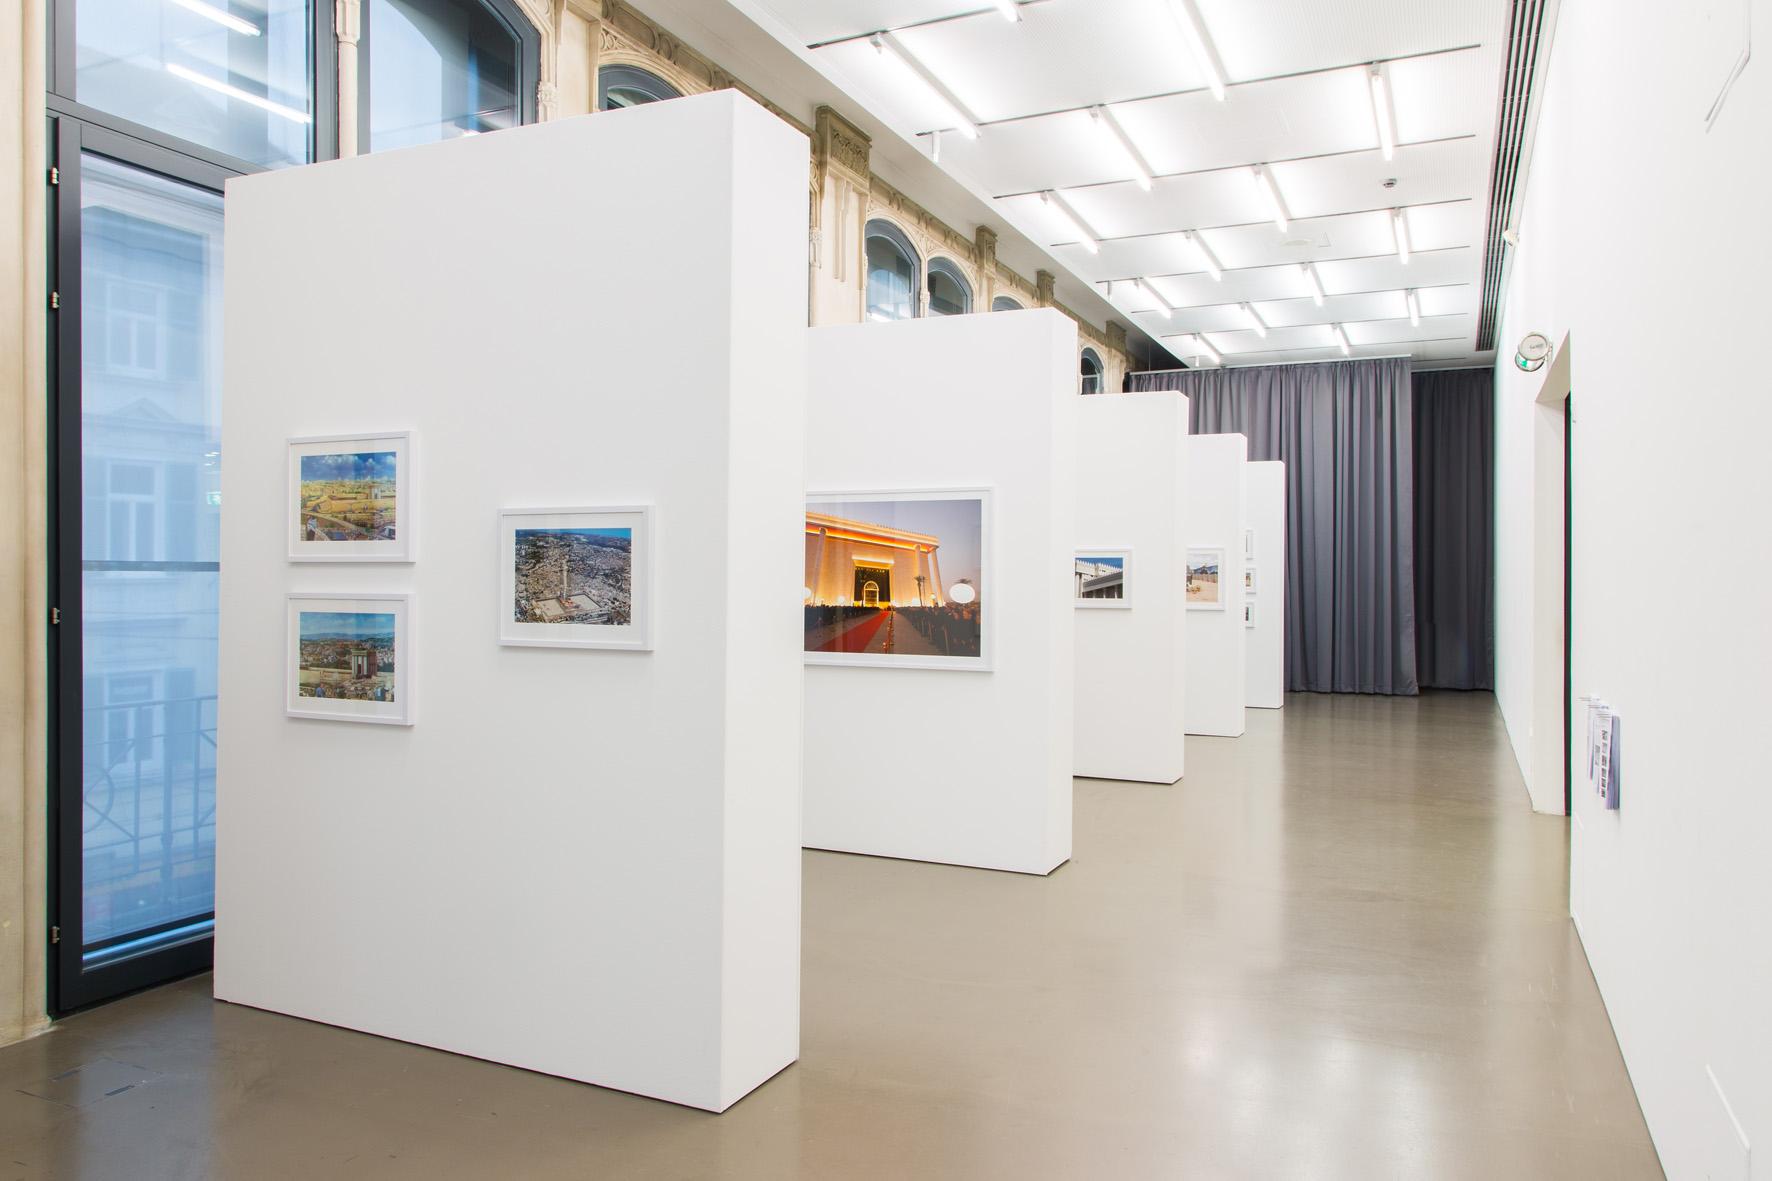 Efrat ShviliThe Jersusalem Experience | Camera Austria